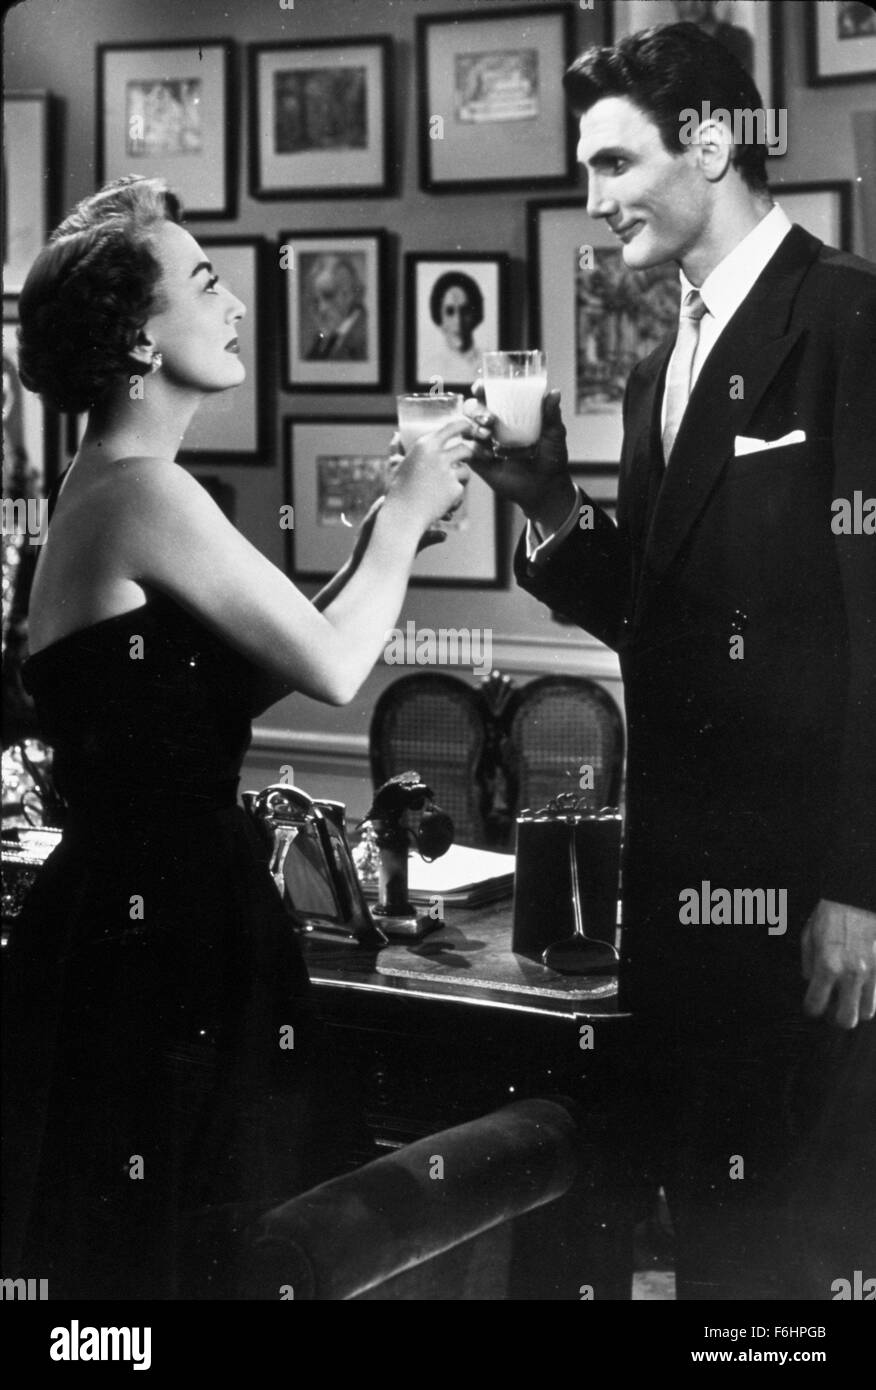 Jack Palance Filmes Stunning 1952, film title: sudden fear, director: david miller, pictured